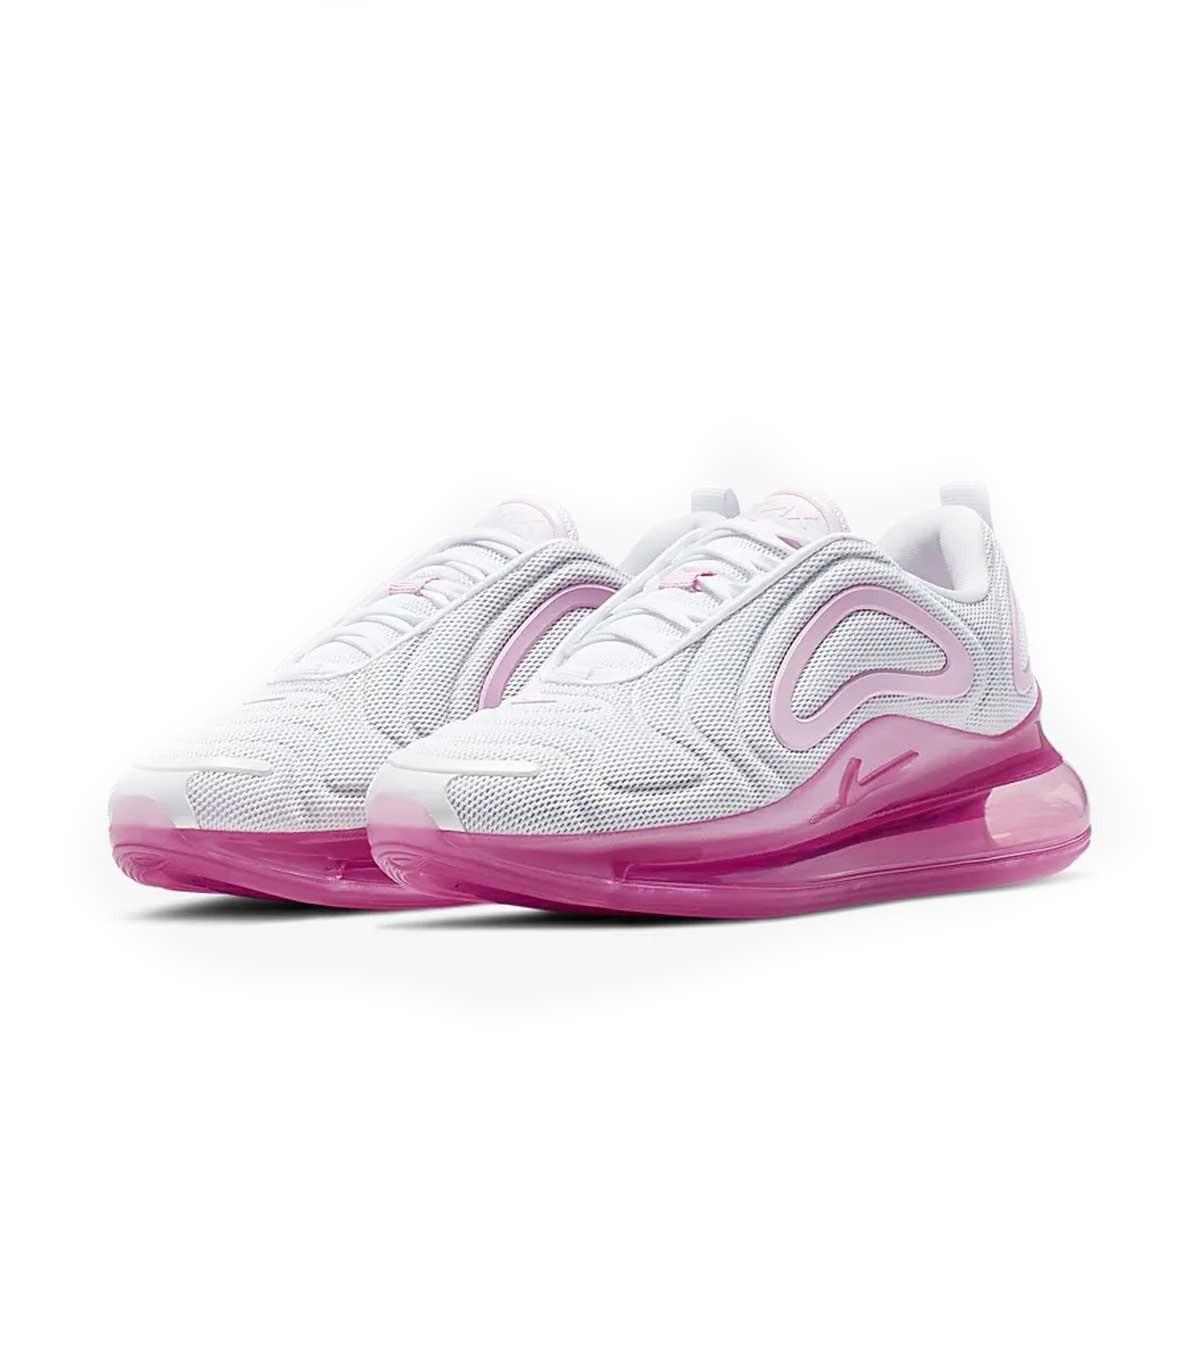 air max 720 rosa